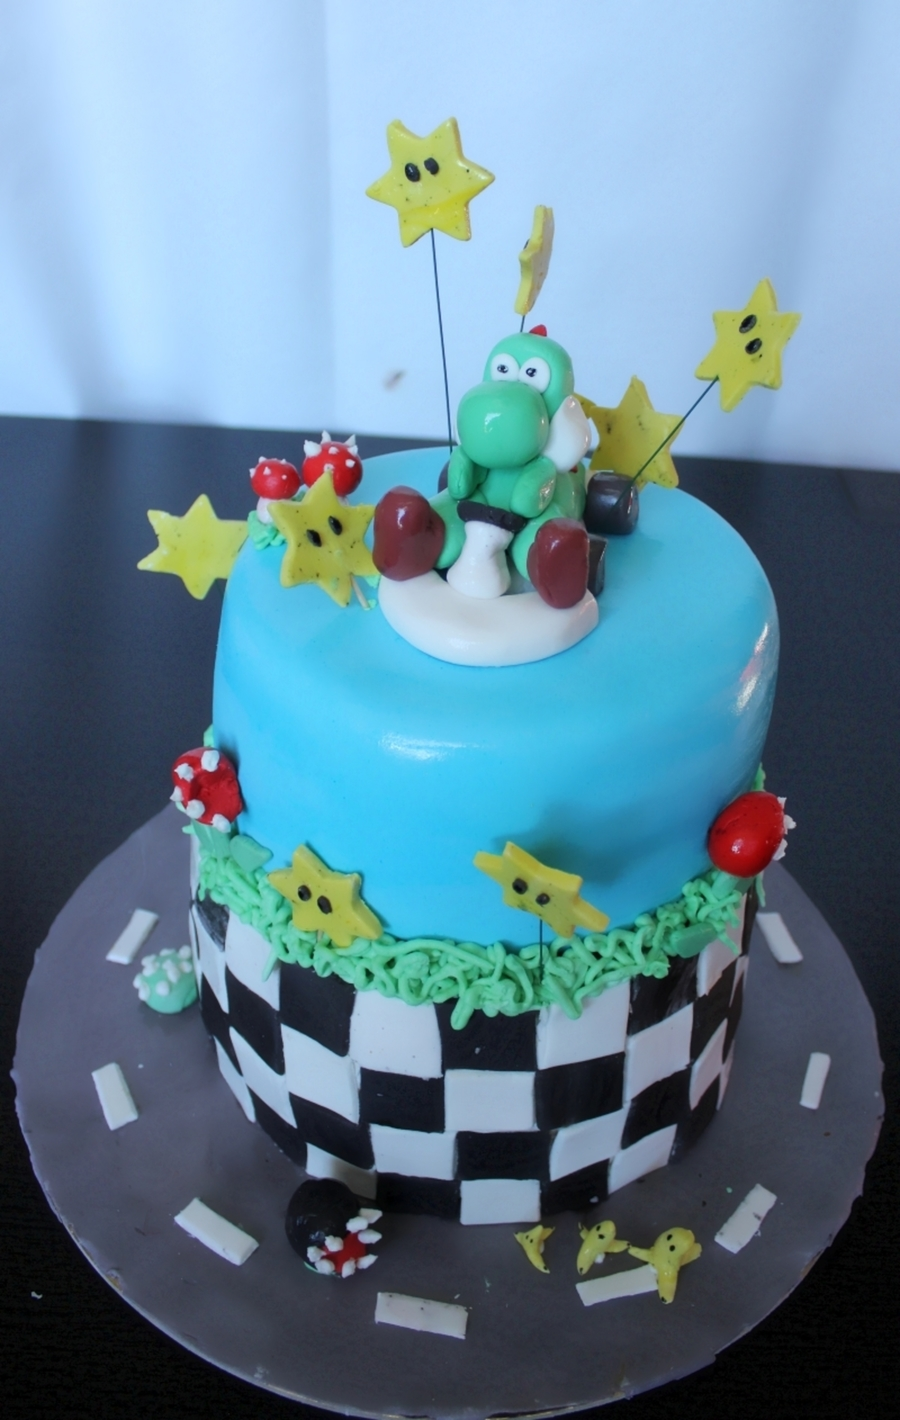 Mario Kart Wee Yoshi Cakecentral Com